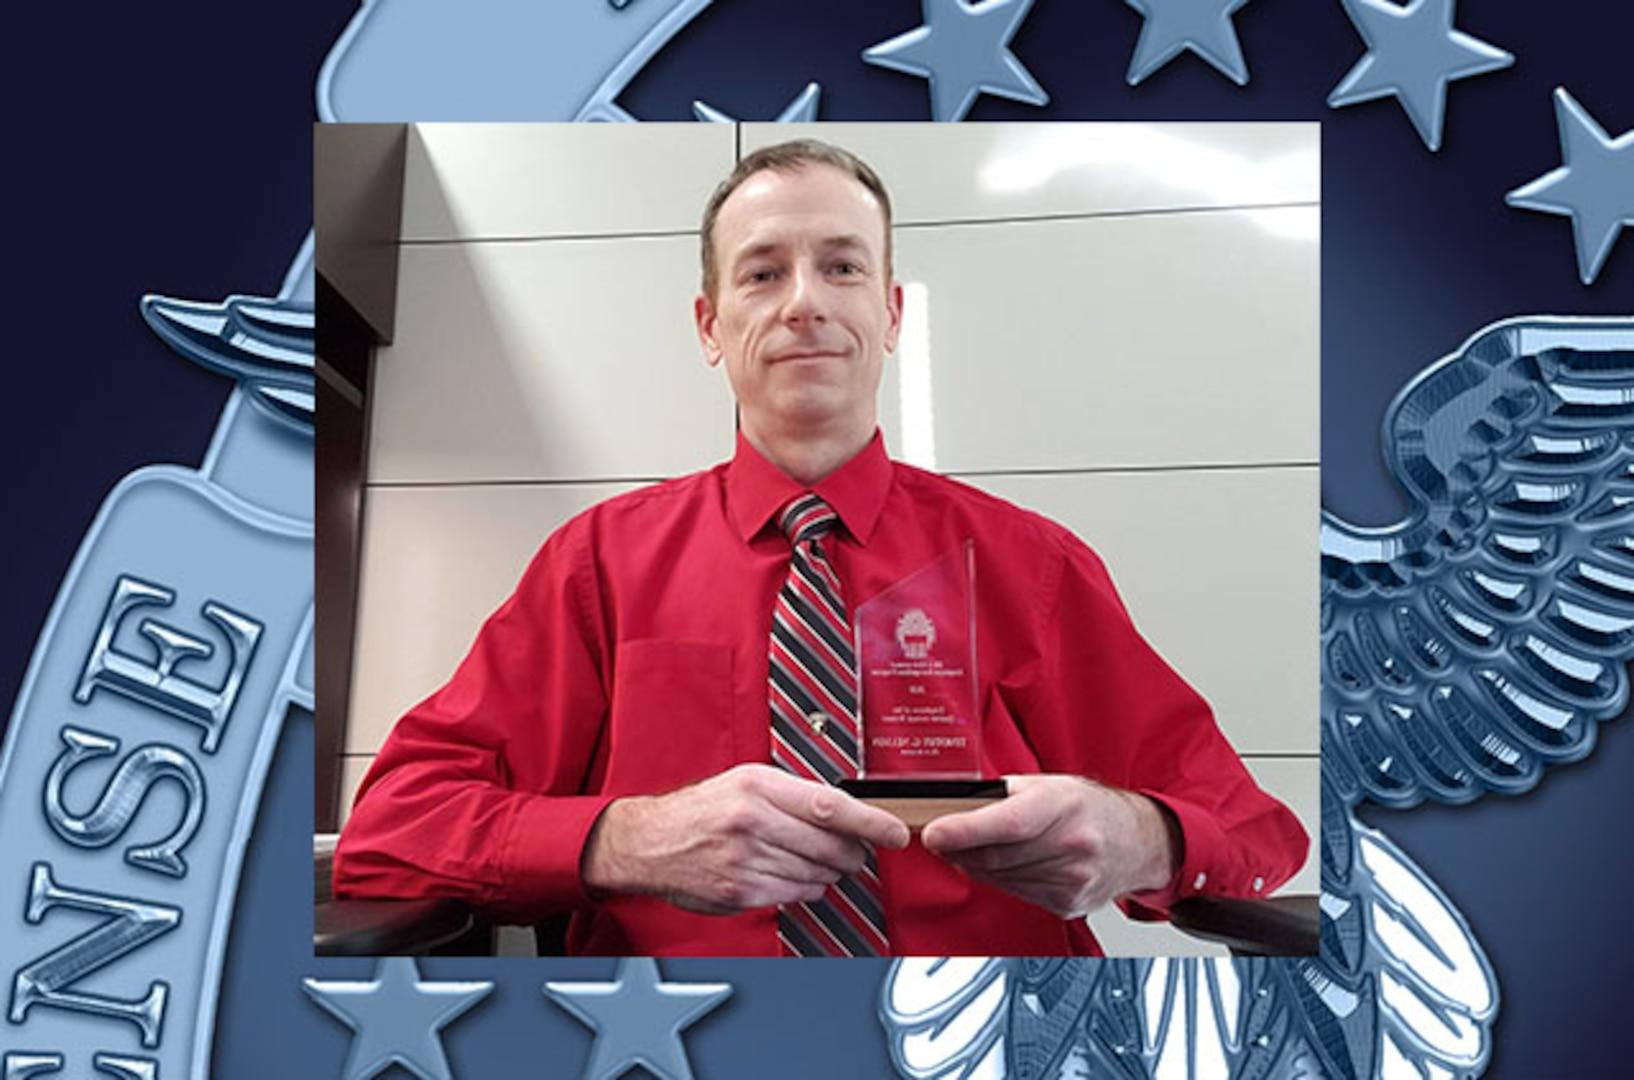 DLA Aviation employee Timothy Nelson wins DLA Employee of the Quarter Award